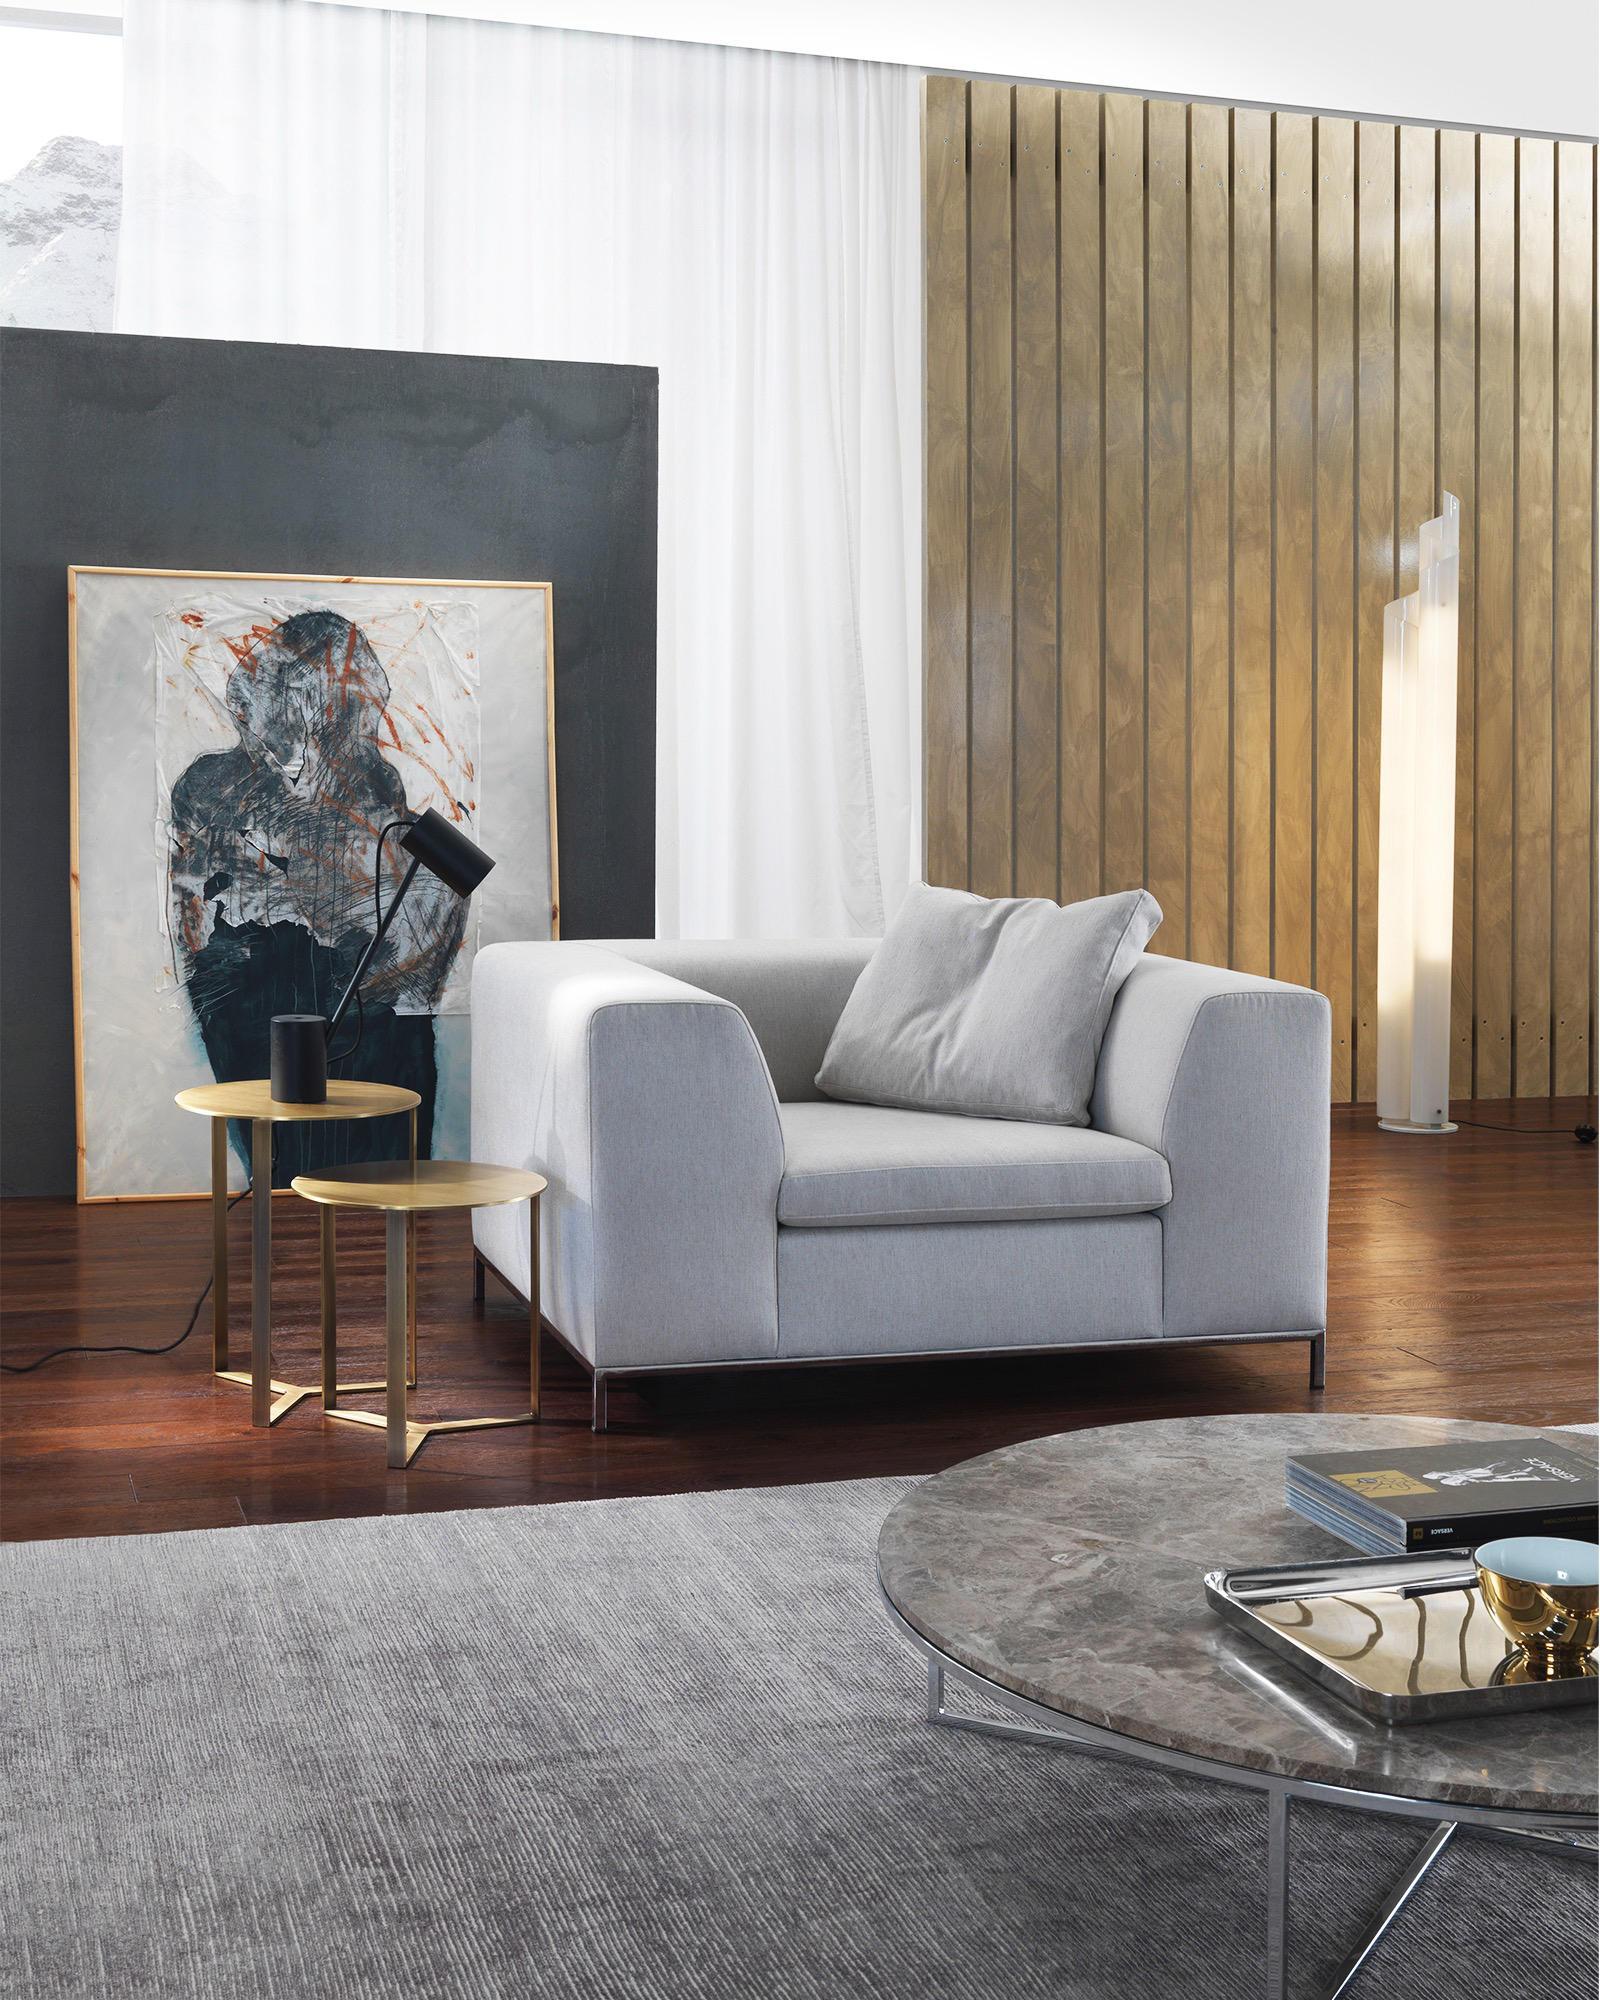 NEW YORK SOFA - Sofas From Marelli